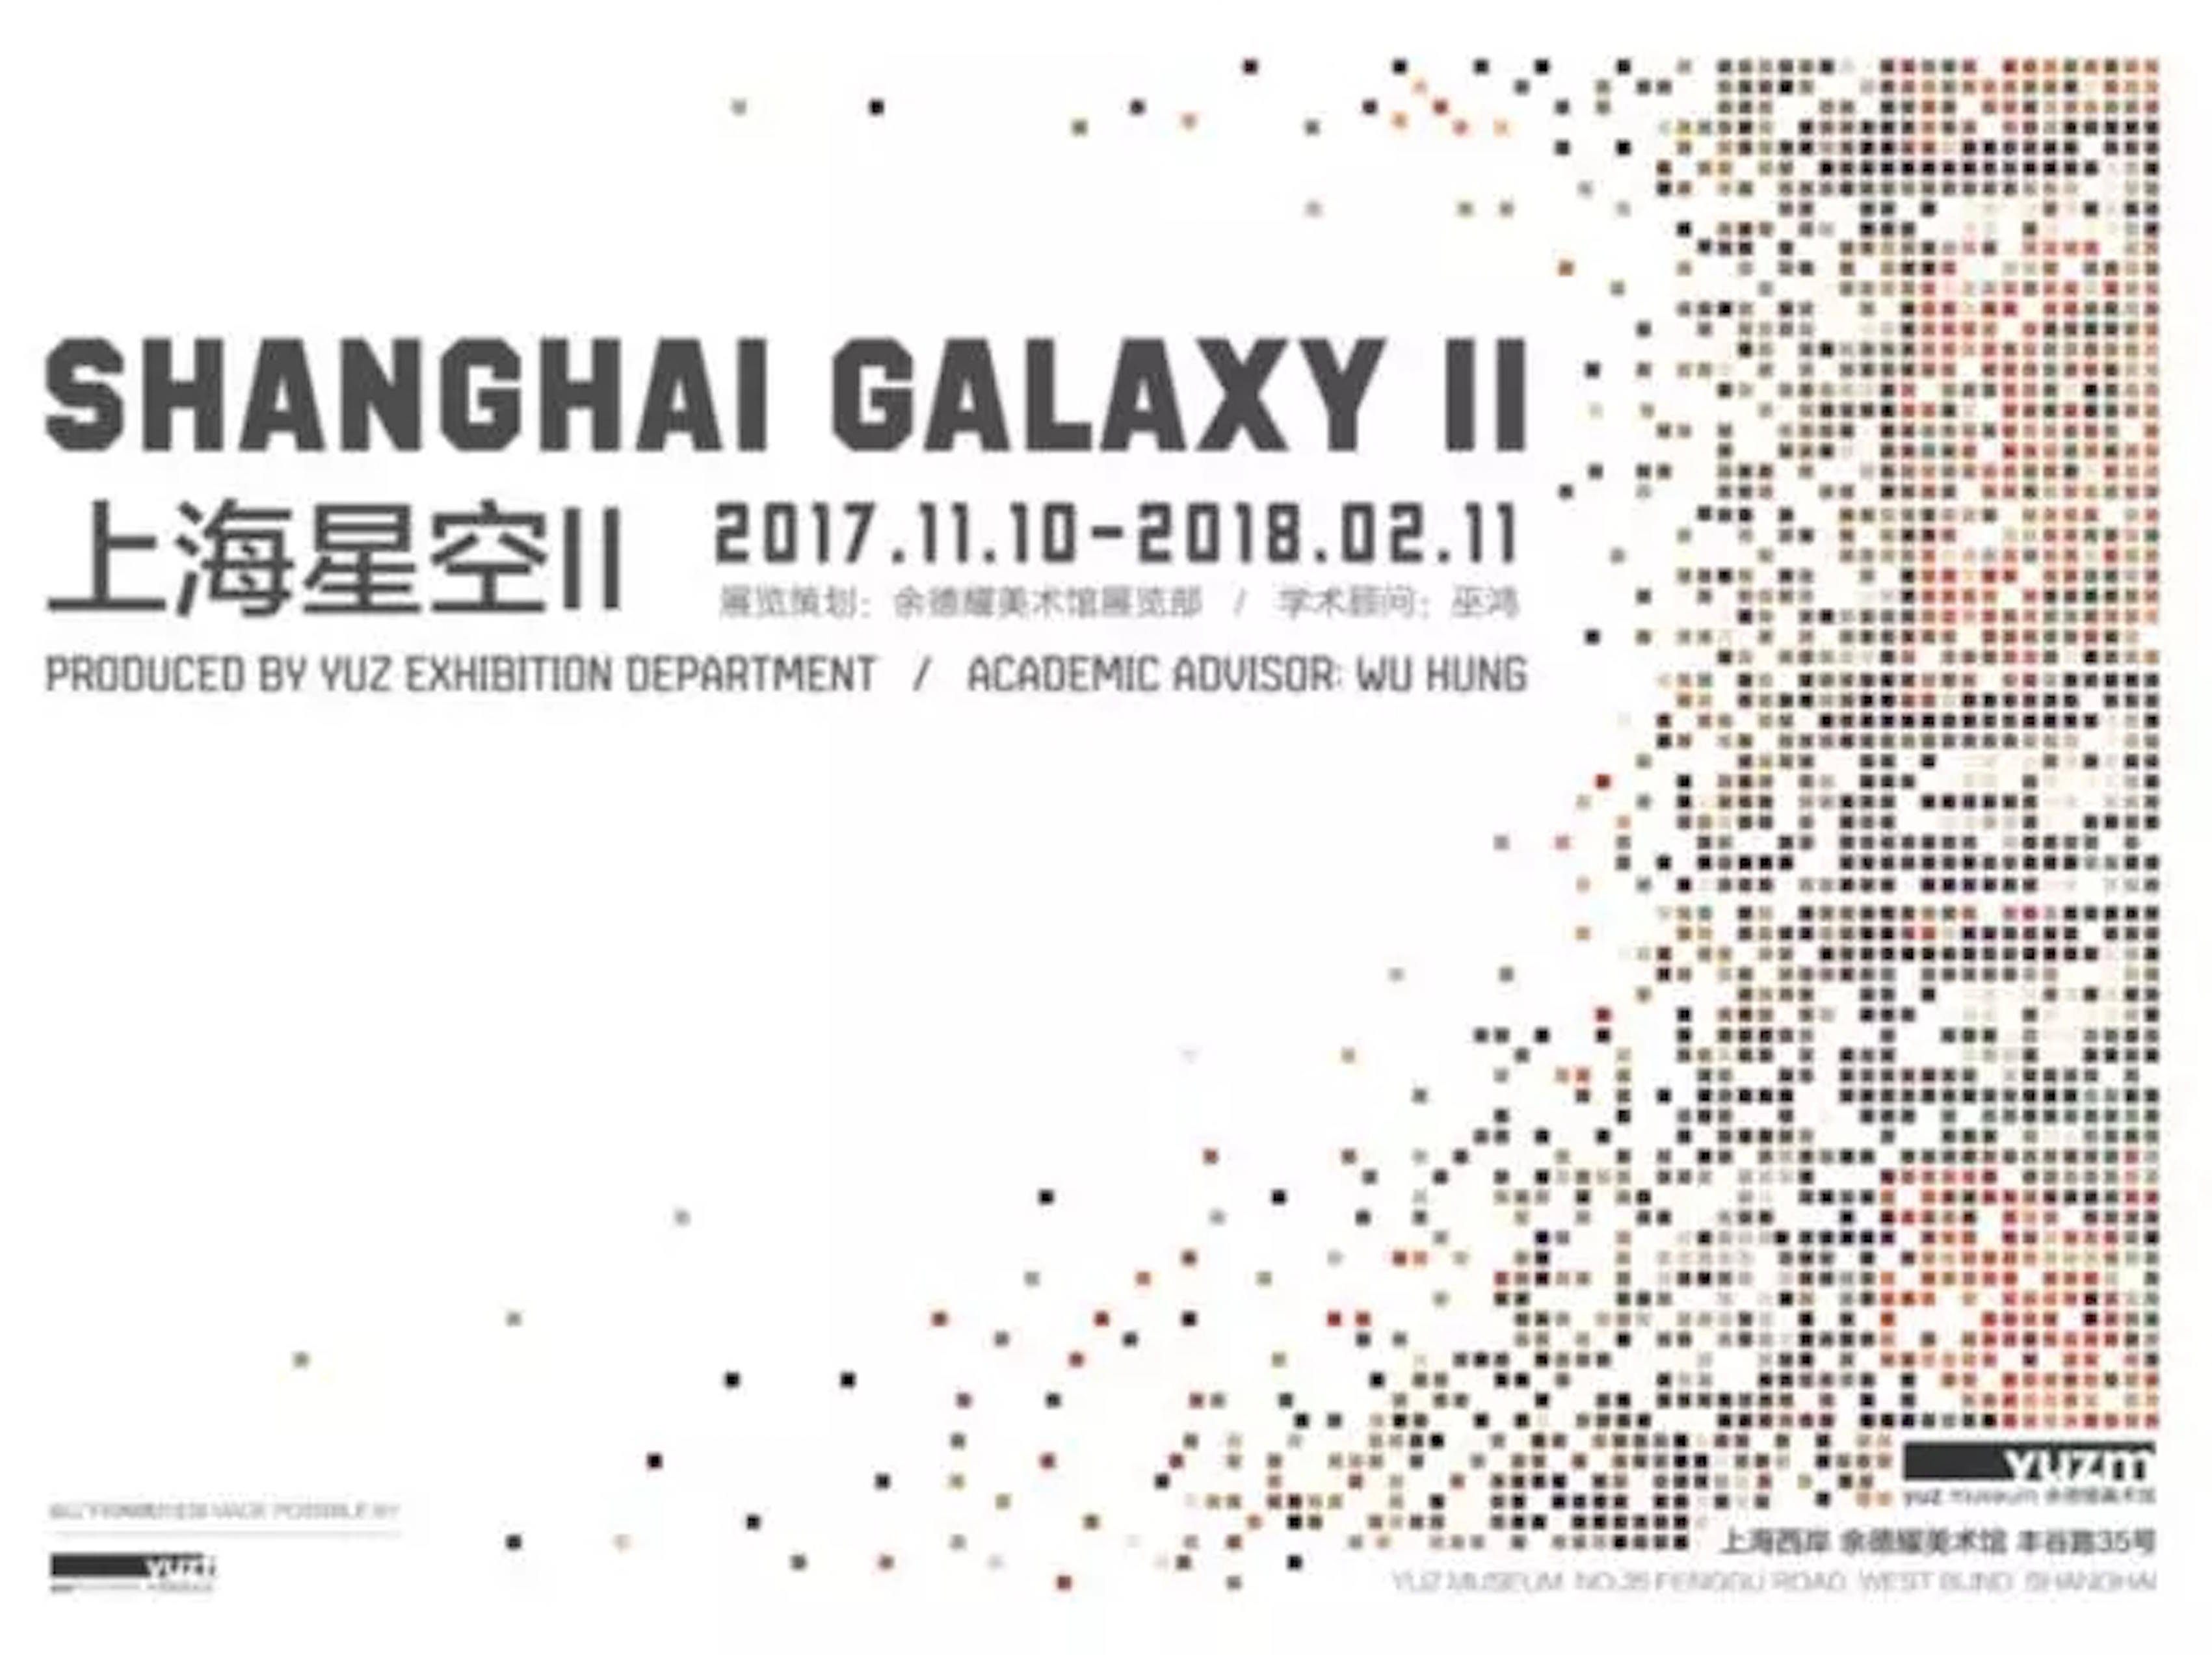 20171112_090823_000